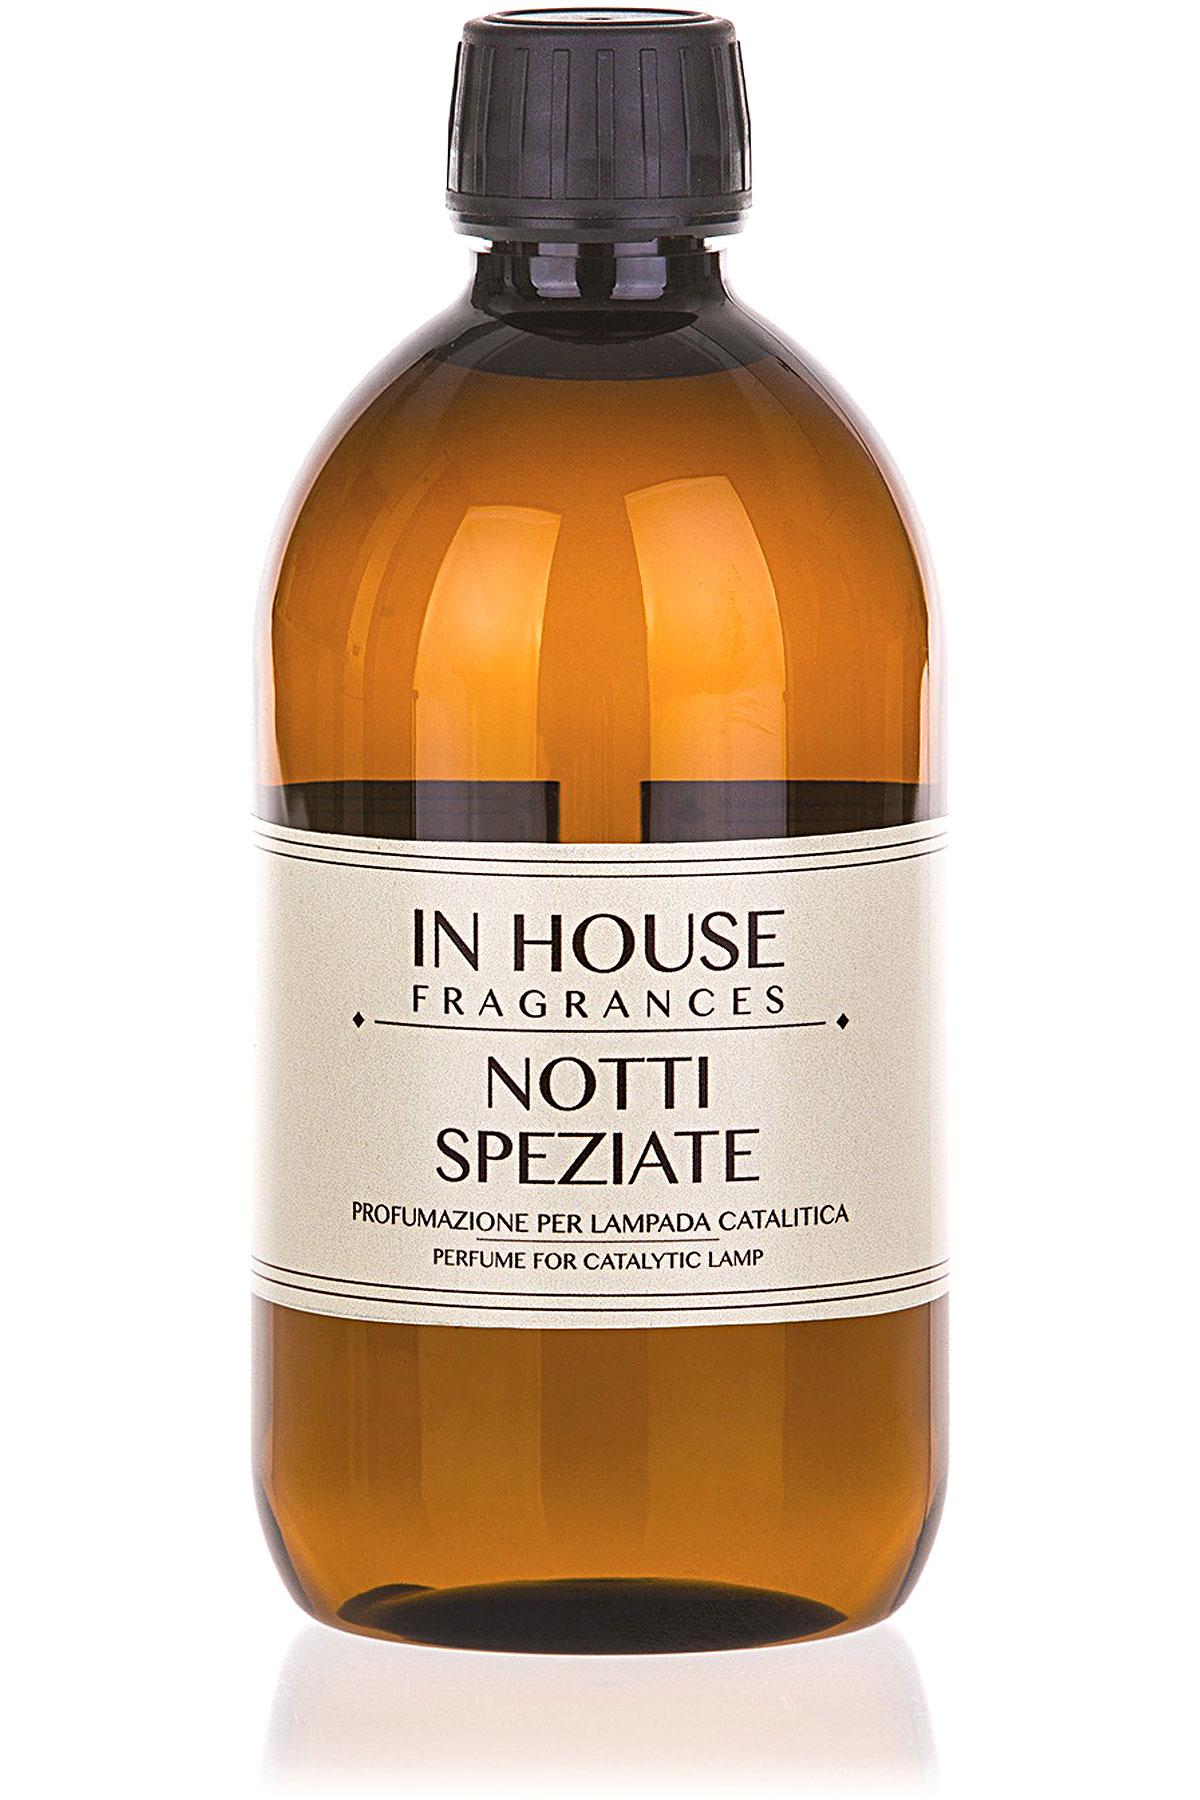 In House Fragrances Home Scents for Men, Notti Speziate - Catalyst Perfume Lamp Refill - 500 Ml, 2019, 500 ml